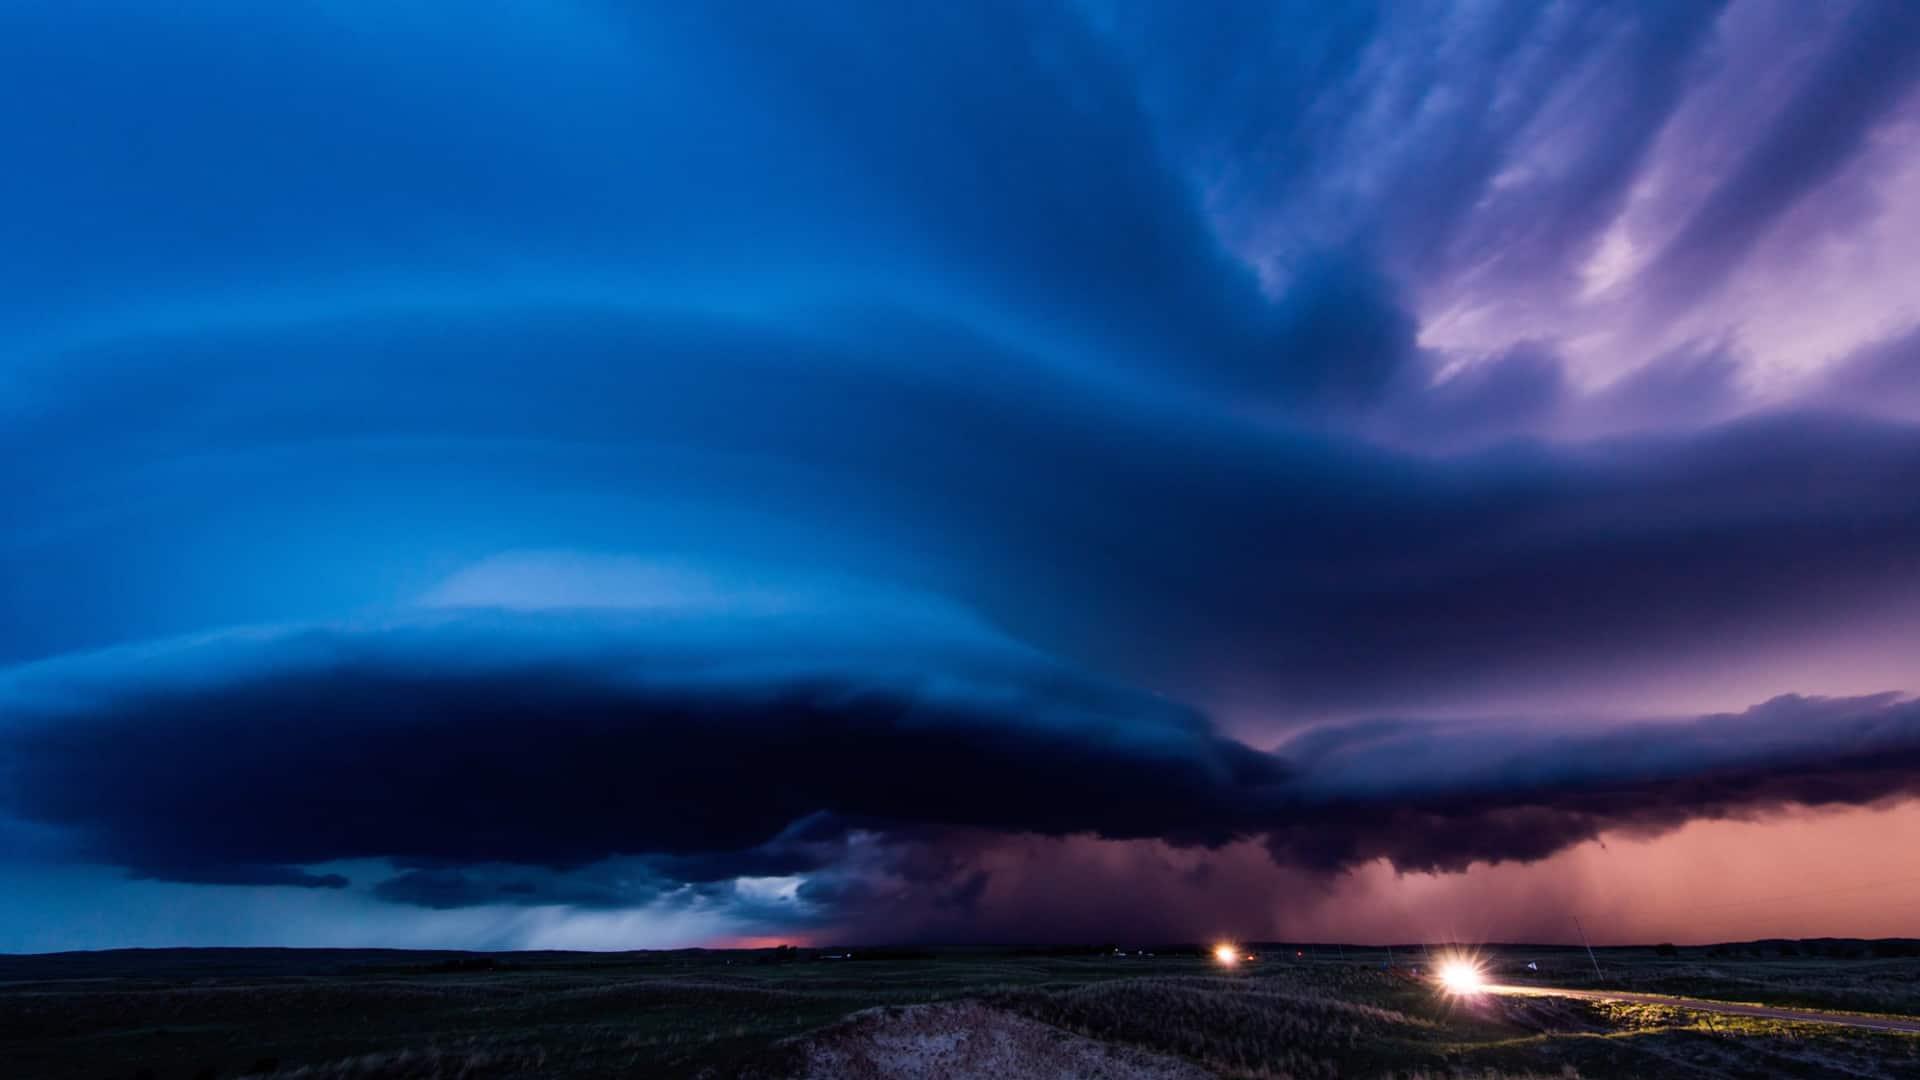 Vorticity 2 فیلمی تایم لپس از توفان های چرخشی و آسمان وحشی